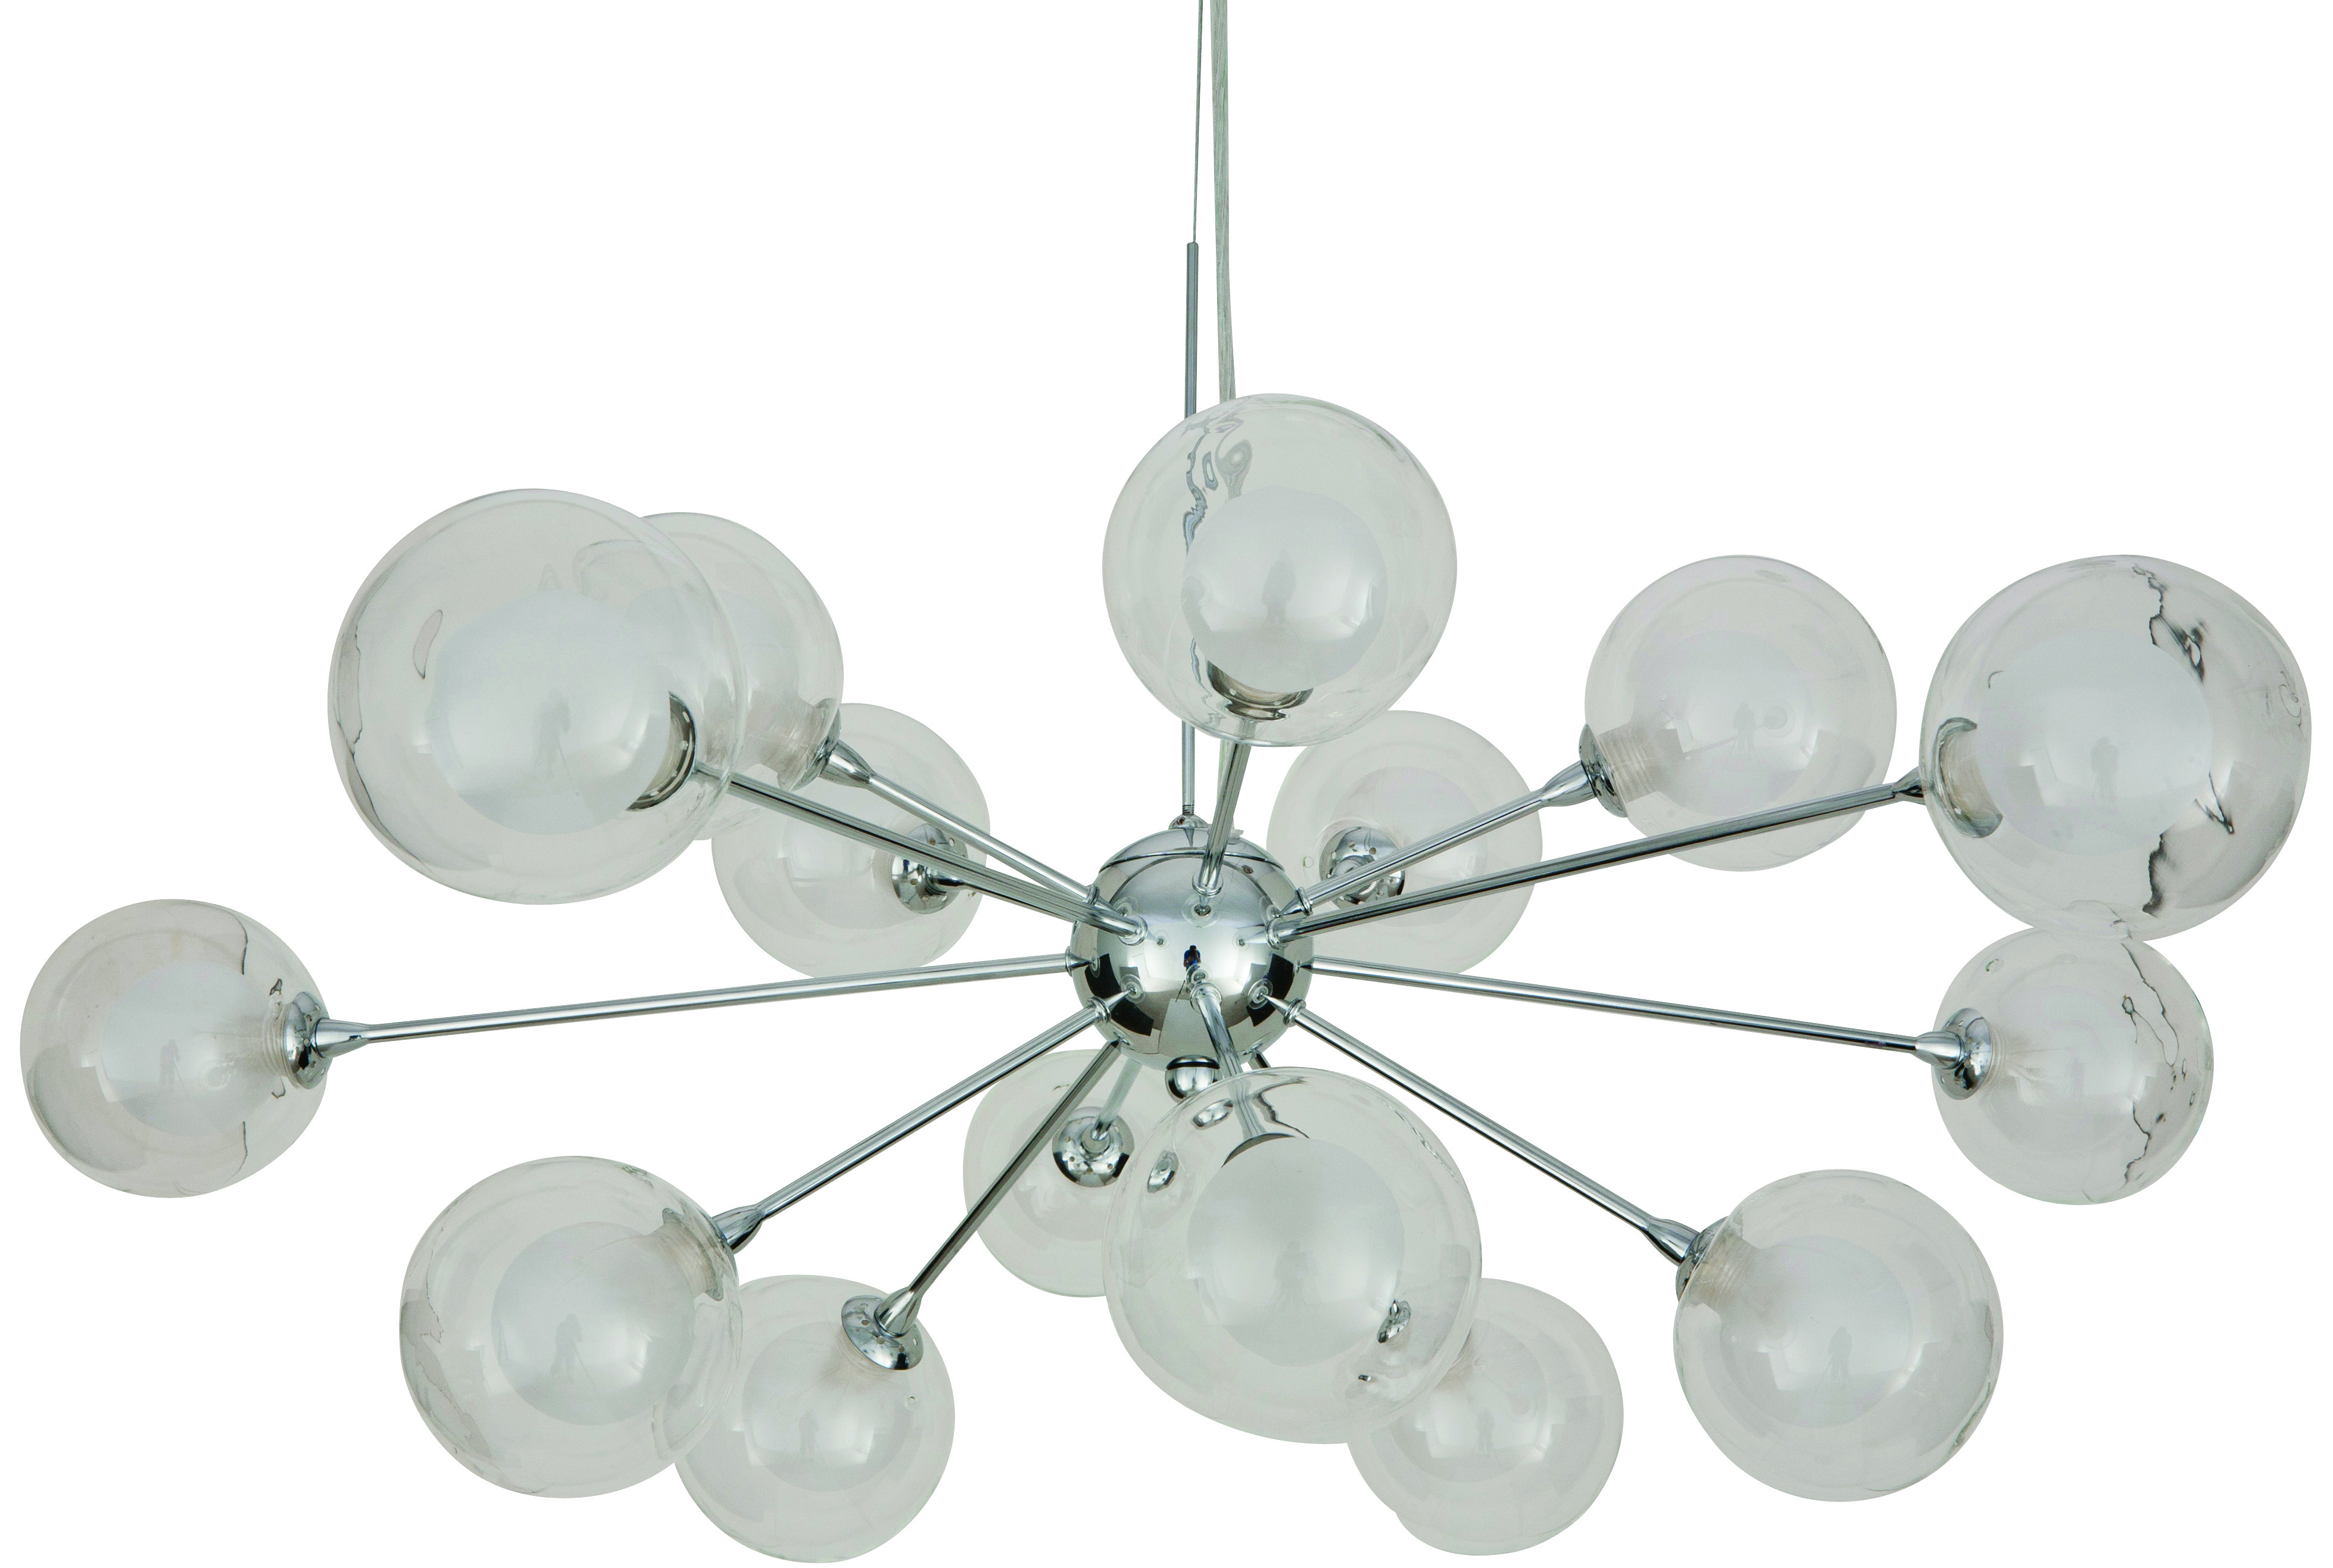 the nuevo hgho129 pendant lamp